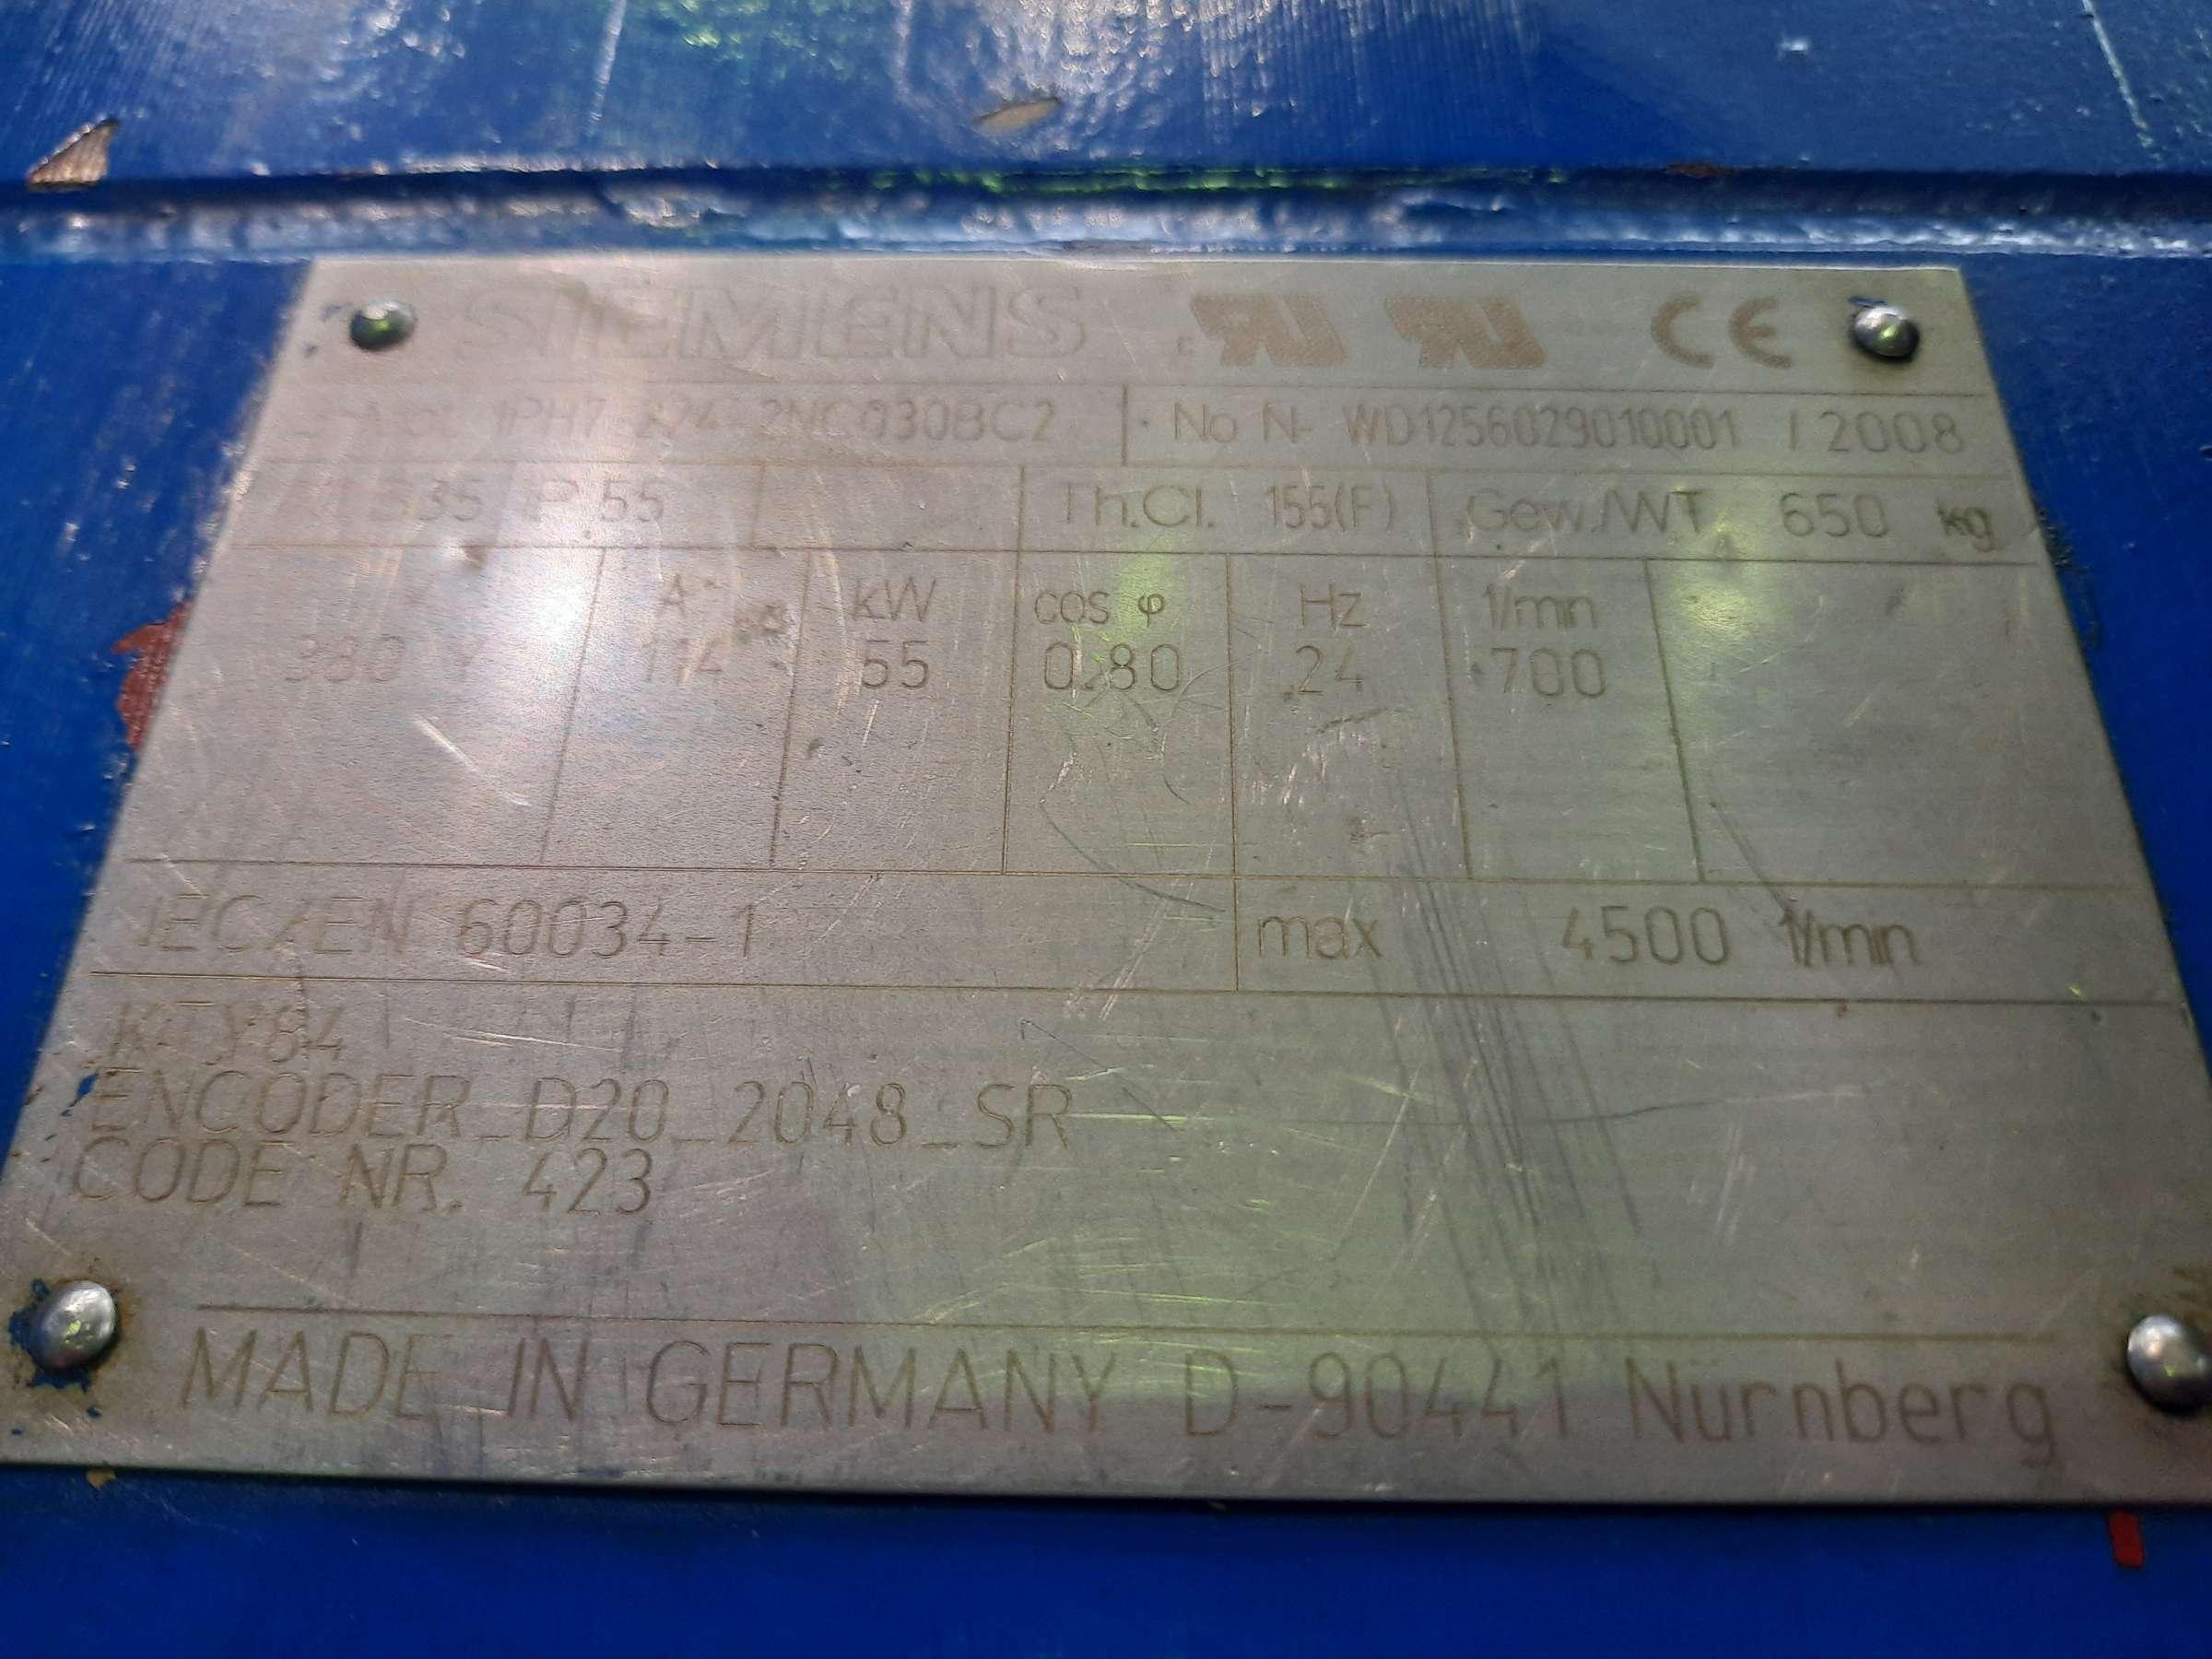 5401-VTL FRORIEP 20 CNC.04